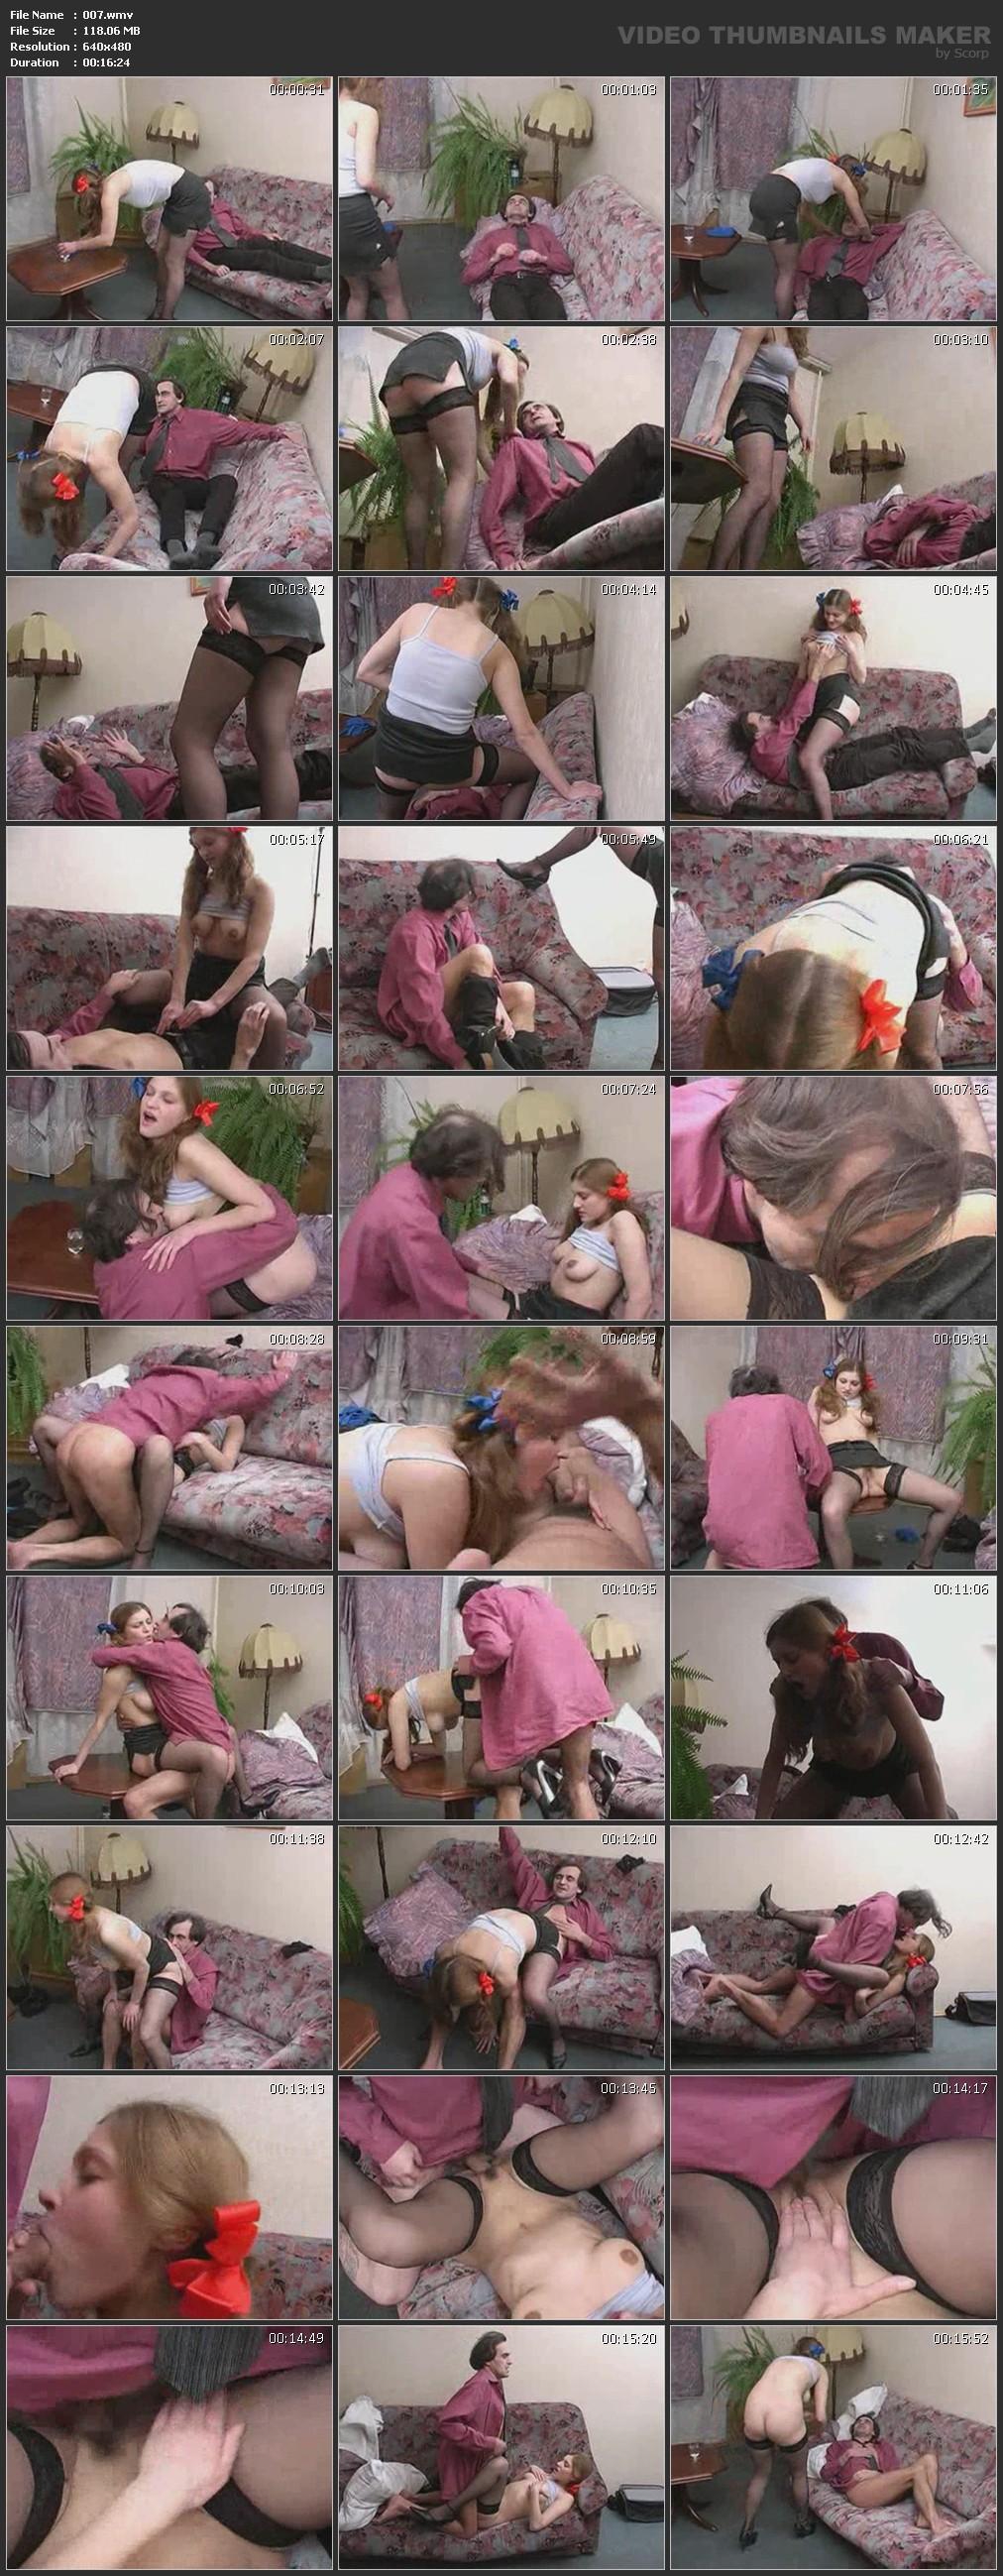 http://i36.fastpic.ru/big/2012/0525/9a/2320f556d4fa0264426740e9d2913b9a.jpg